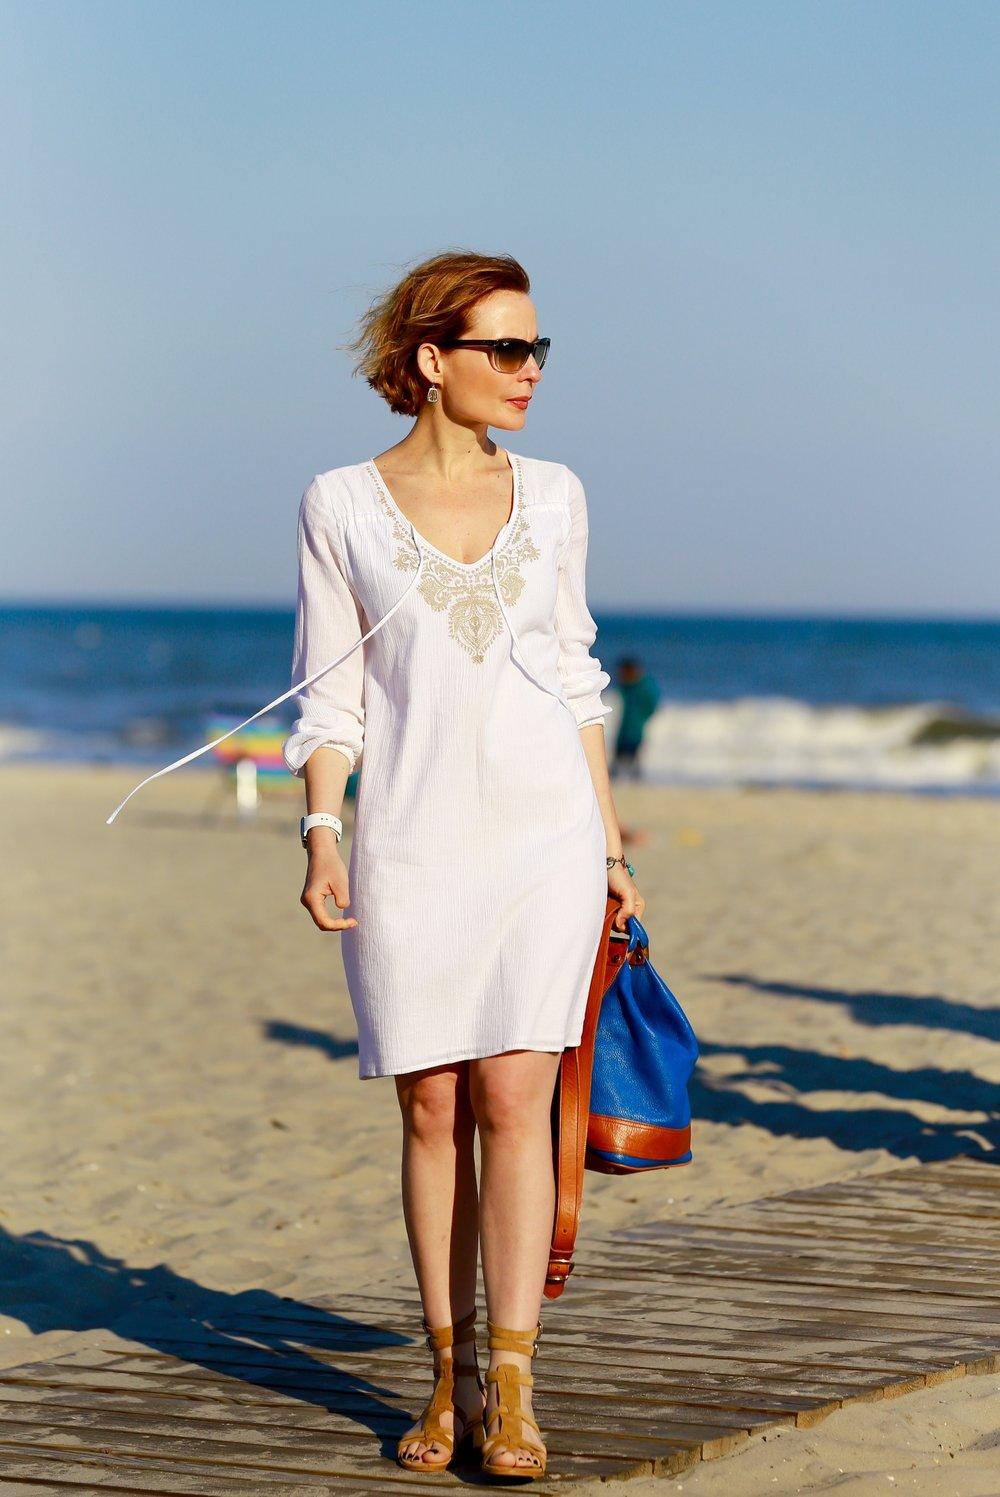 Women's Fashion Inspiration,Summer Fashion Blog,Summer Fashion Inspiration,Women's Summer Style,July Fashion,Russian Fashion Blogger,Tatiana Moskatova 3